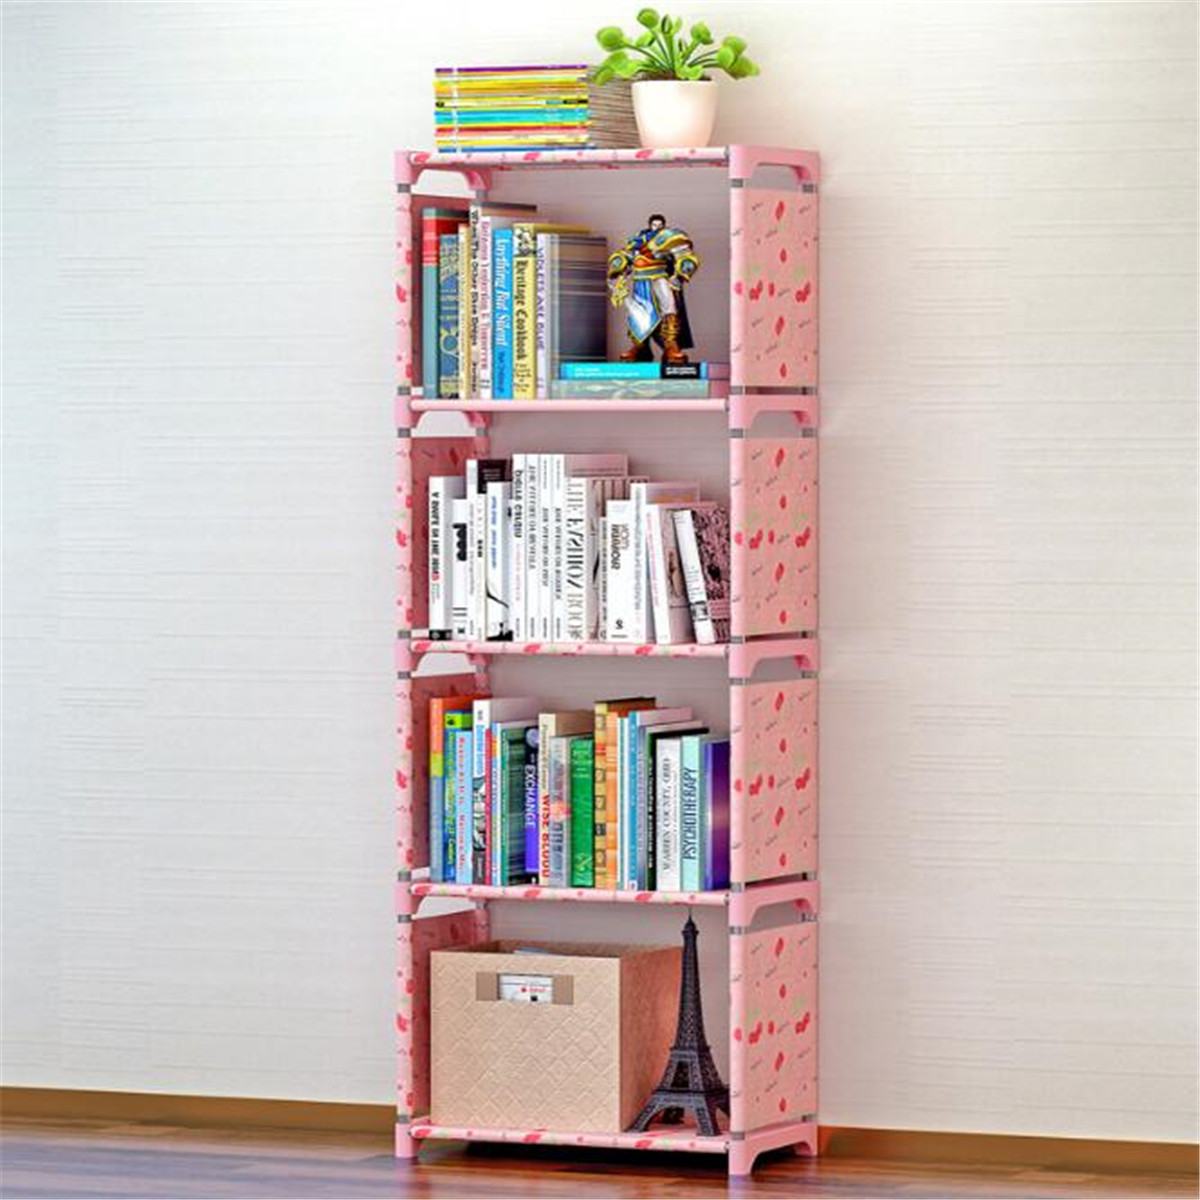 Us 33 44 23 Off Simple Bookshelf Book Storage Shelf For Books Plants Sundries Furniture Diy Combination Shelf Floor Standing Children Bookcase In